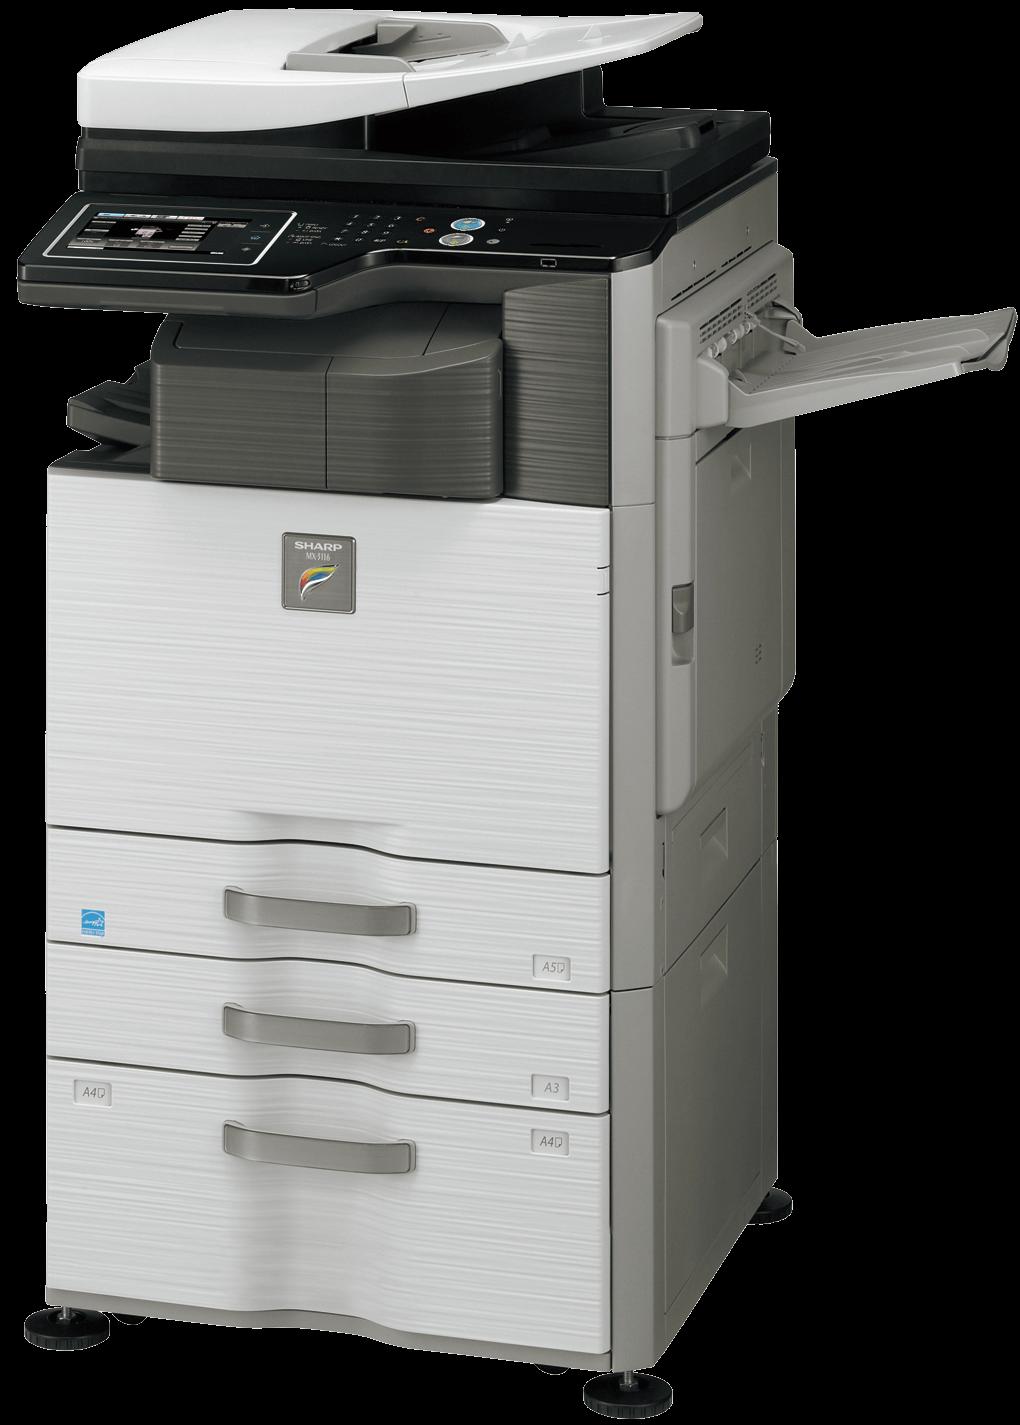 Sharp Photocopiers